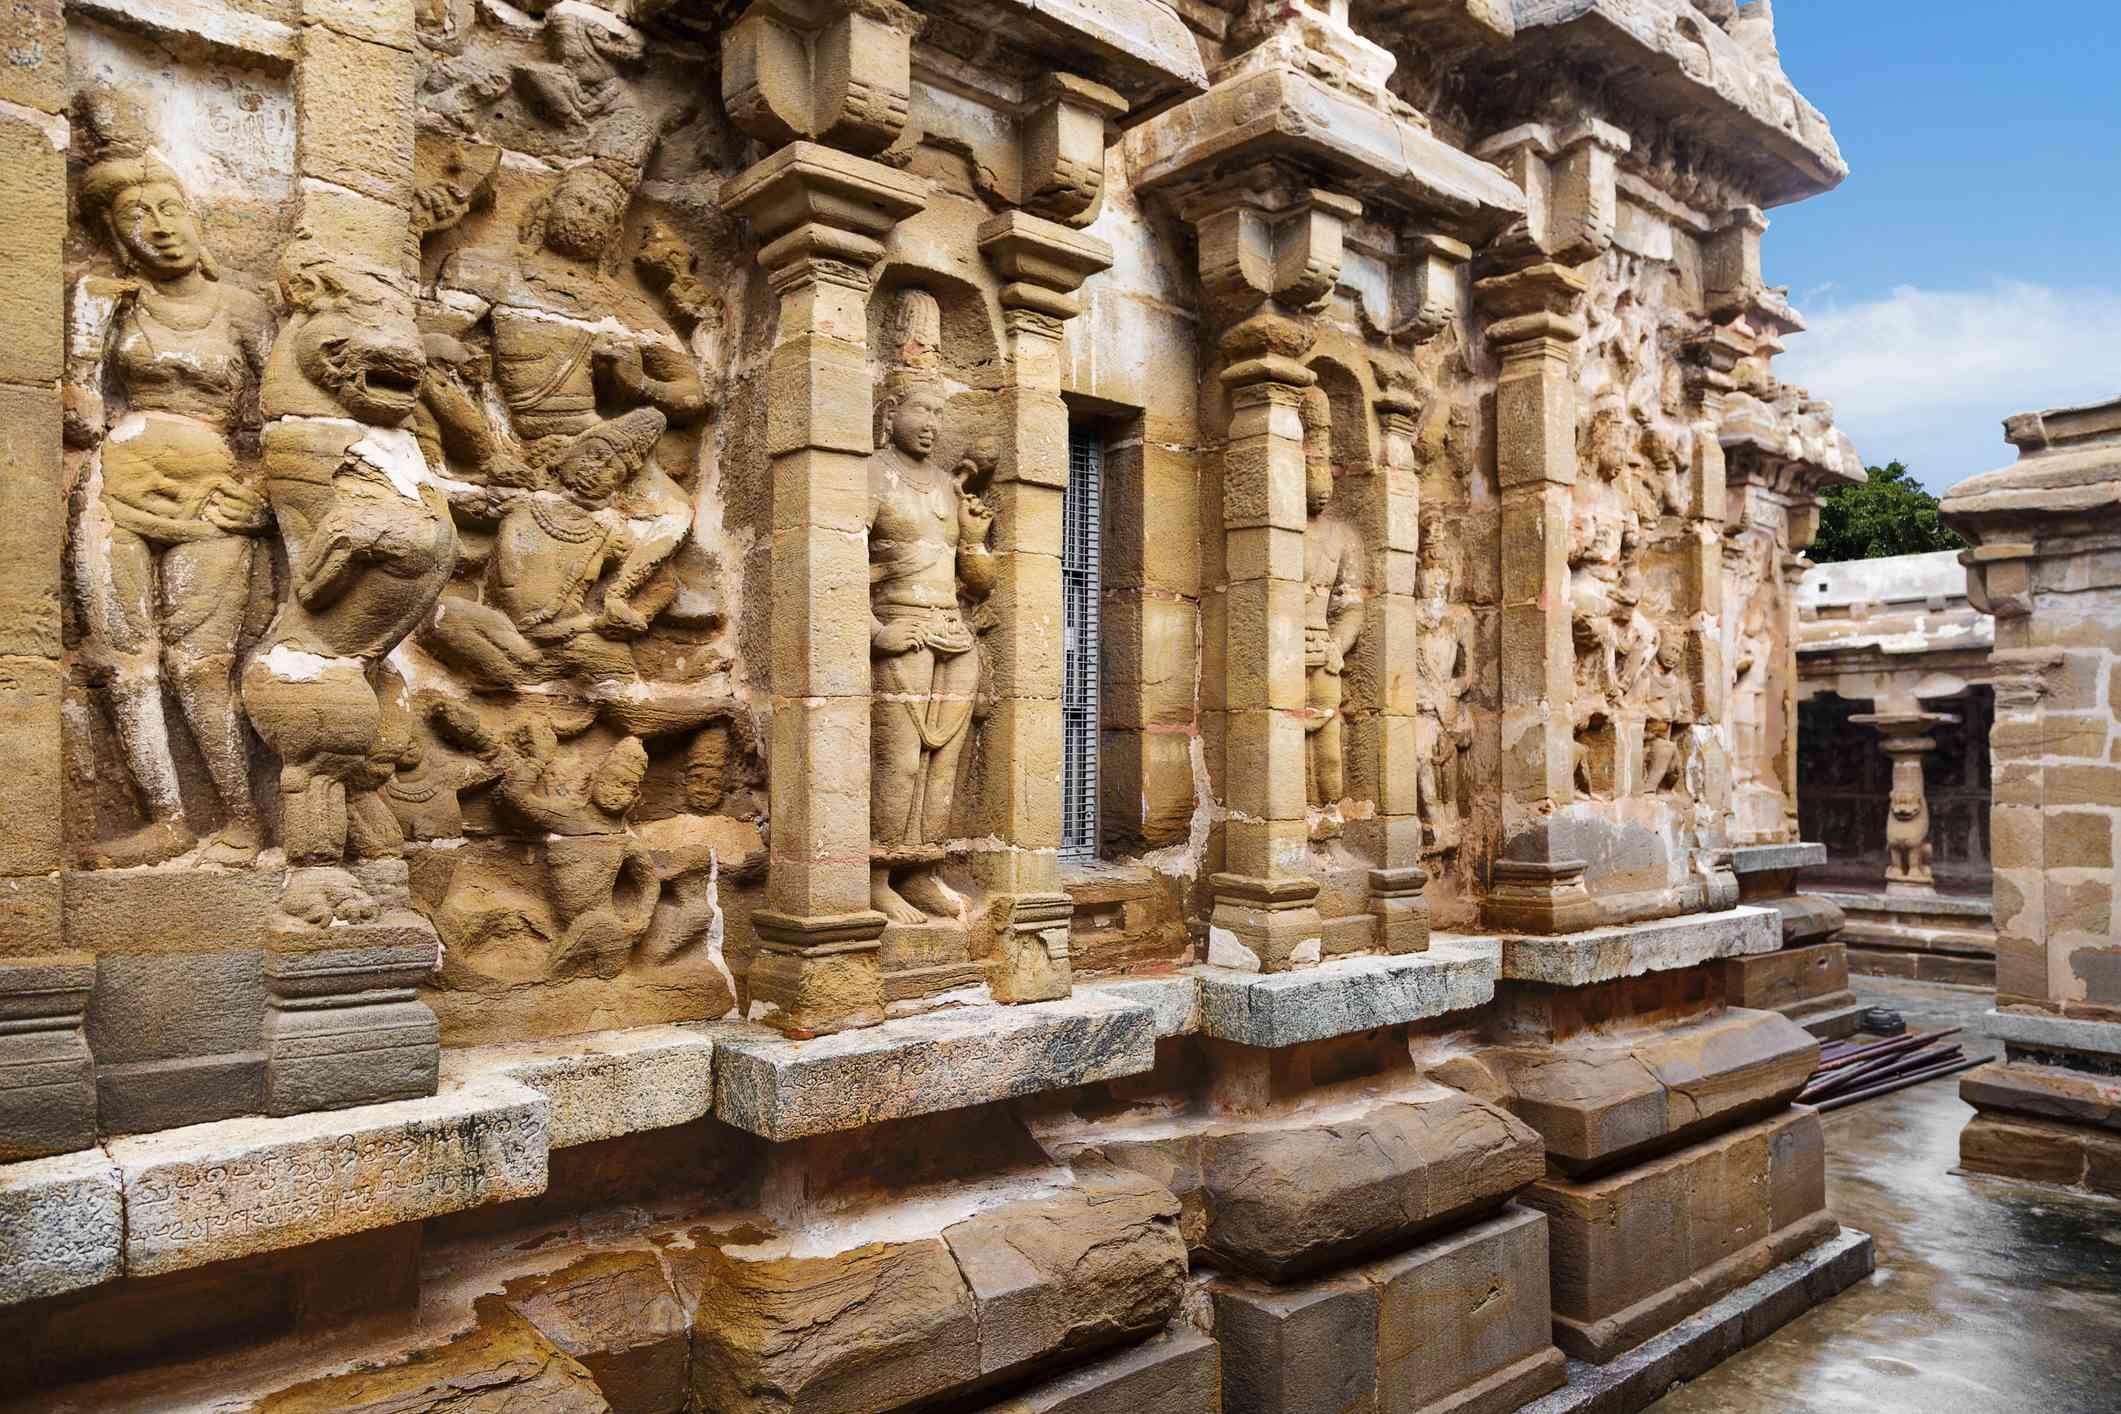 stone carvings of dieties at Thiru Parameswara Vinnagaram (Vaikunta Perumal Temple), Kanchipuram, Tamil Nadu, South India